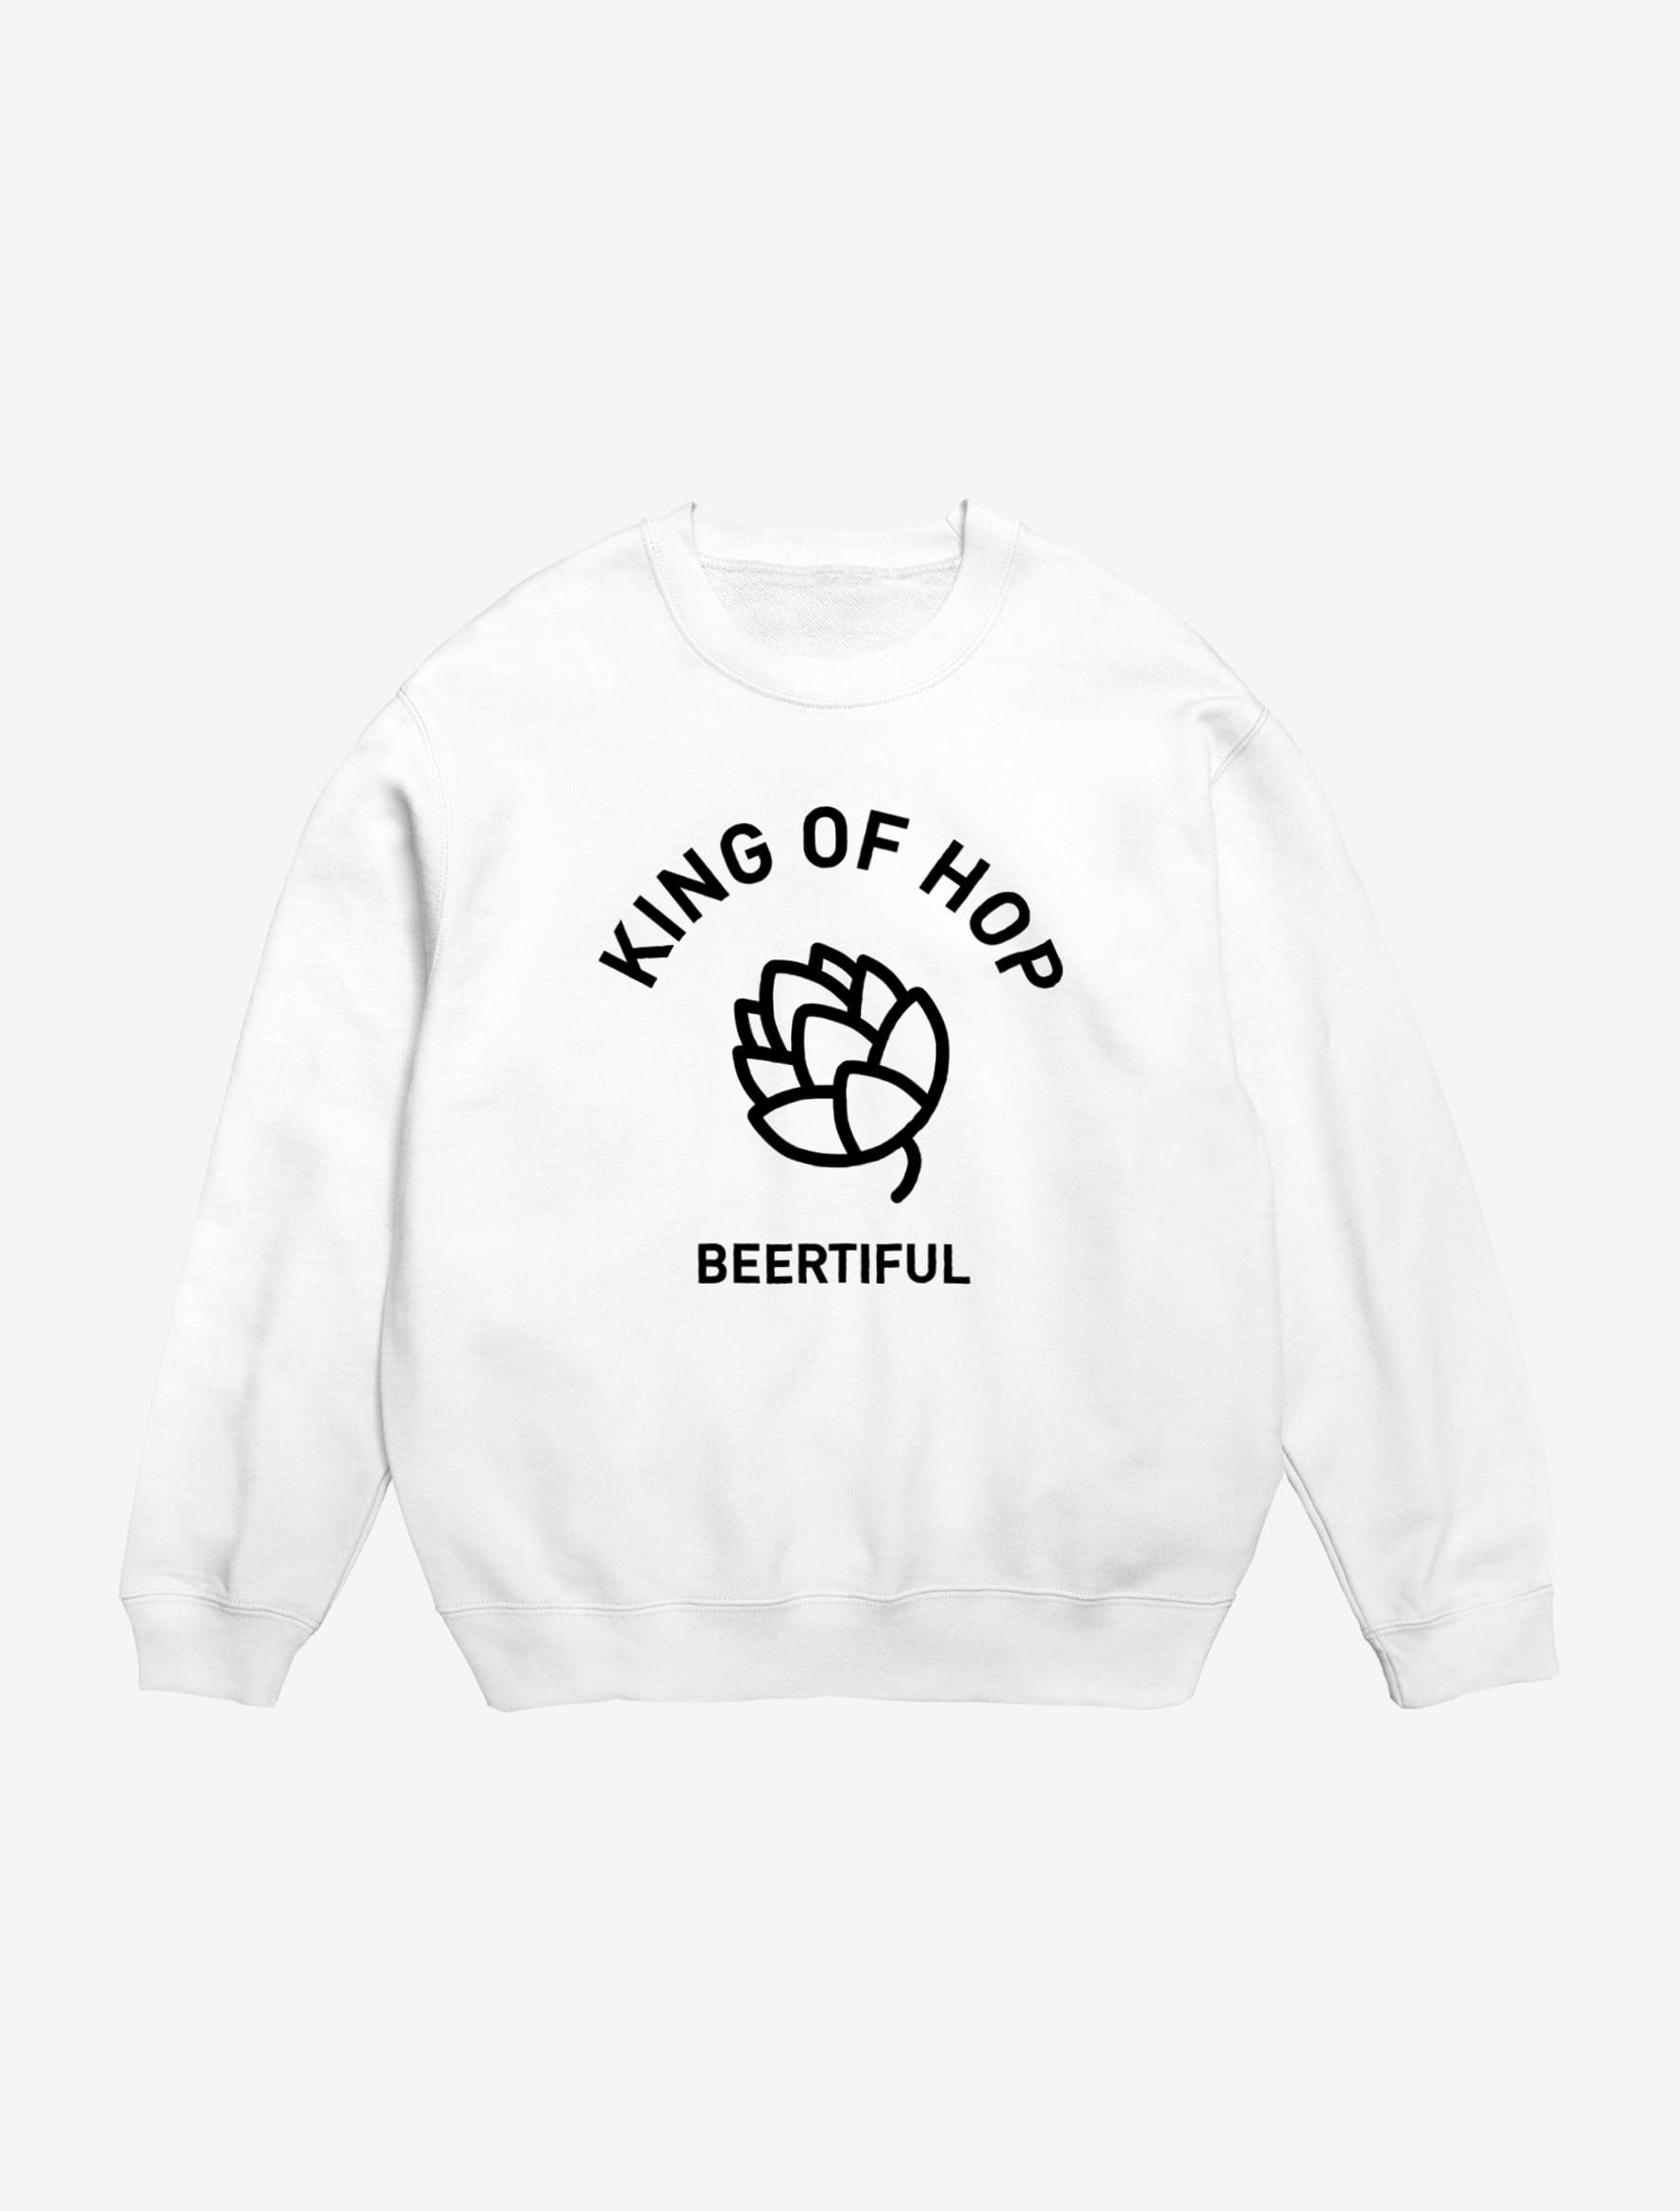 【KING OF HOP】スウェット